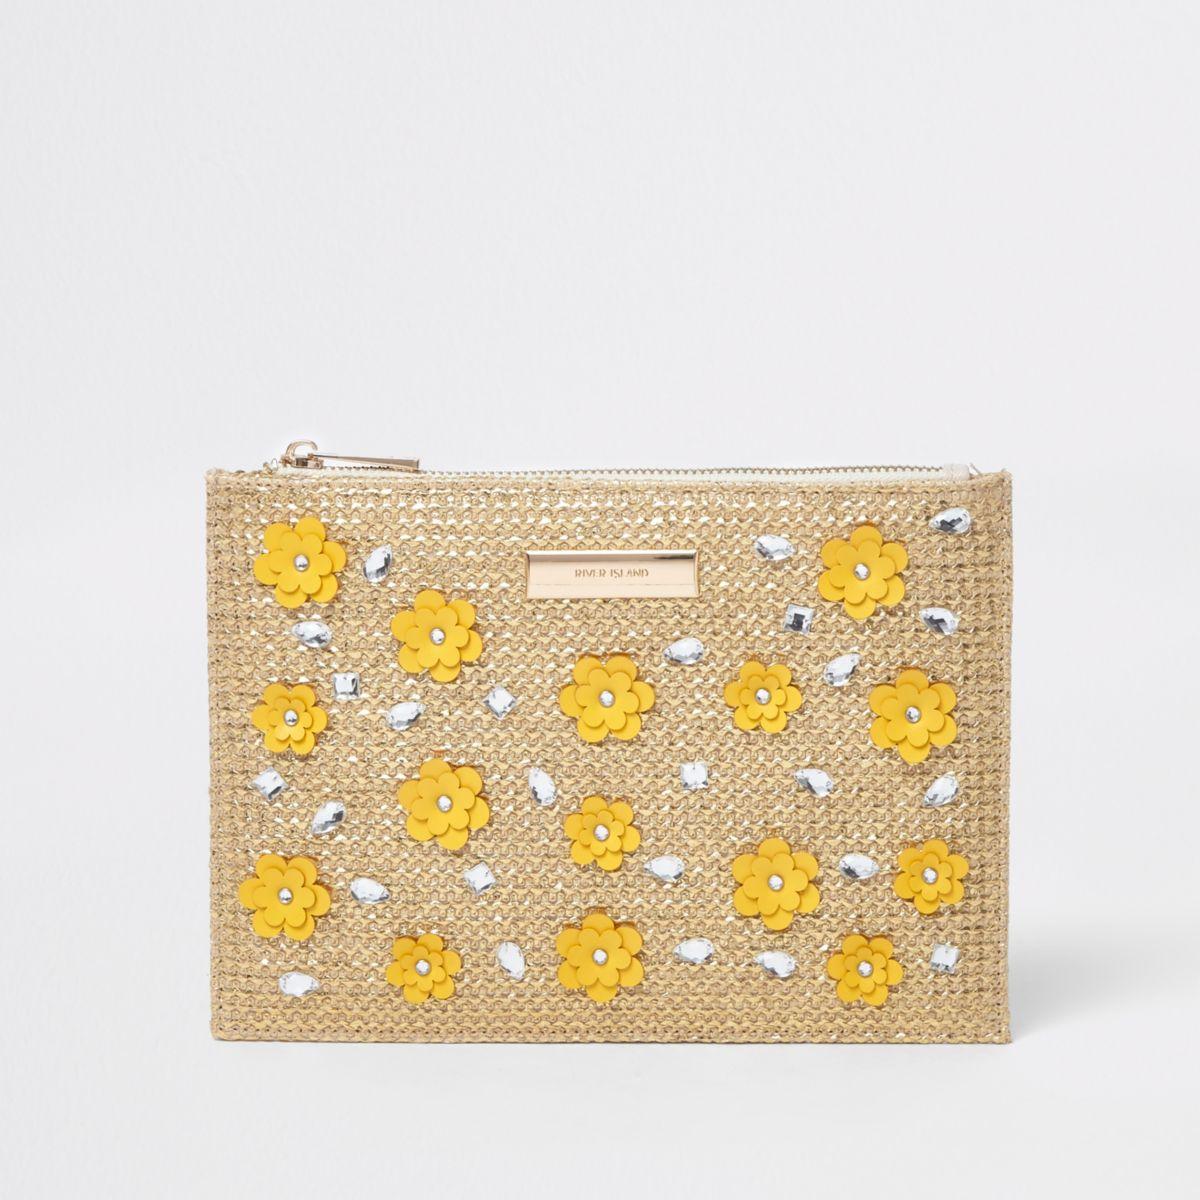 Beige metallic woven 3D flower clutch bag